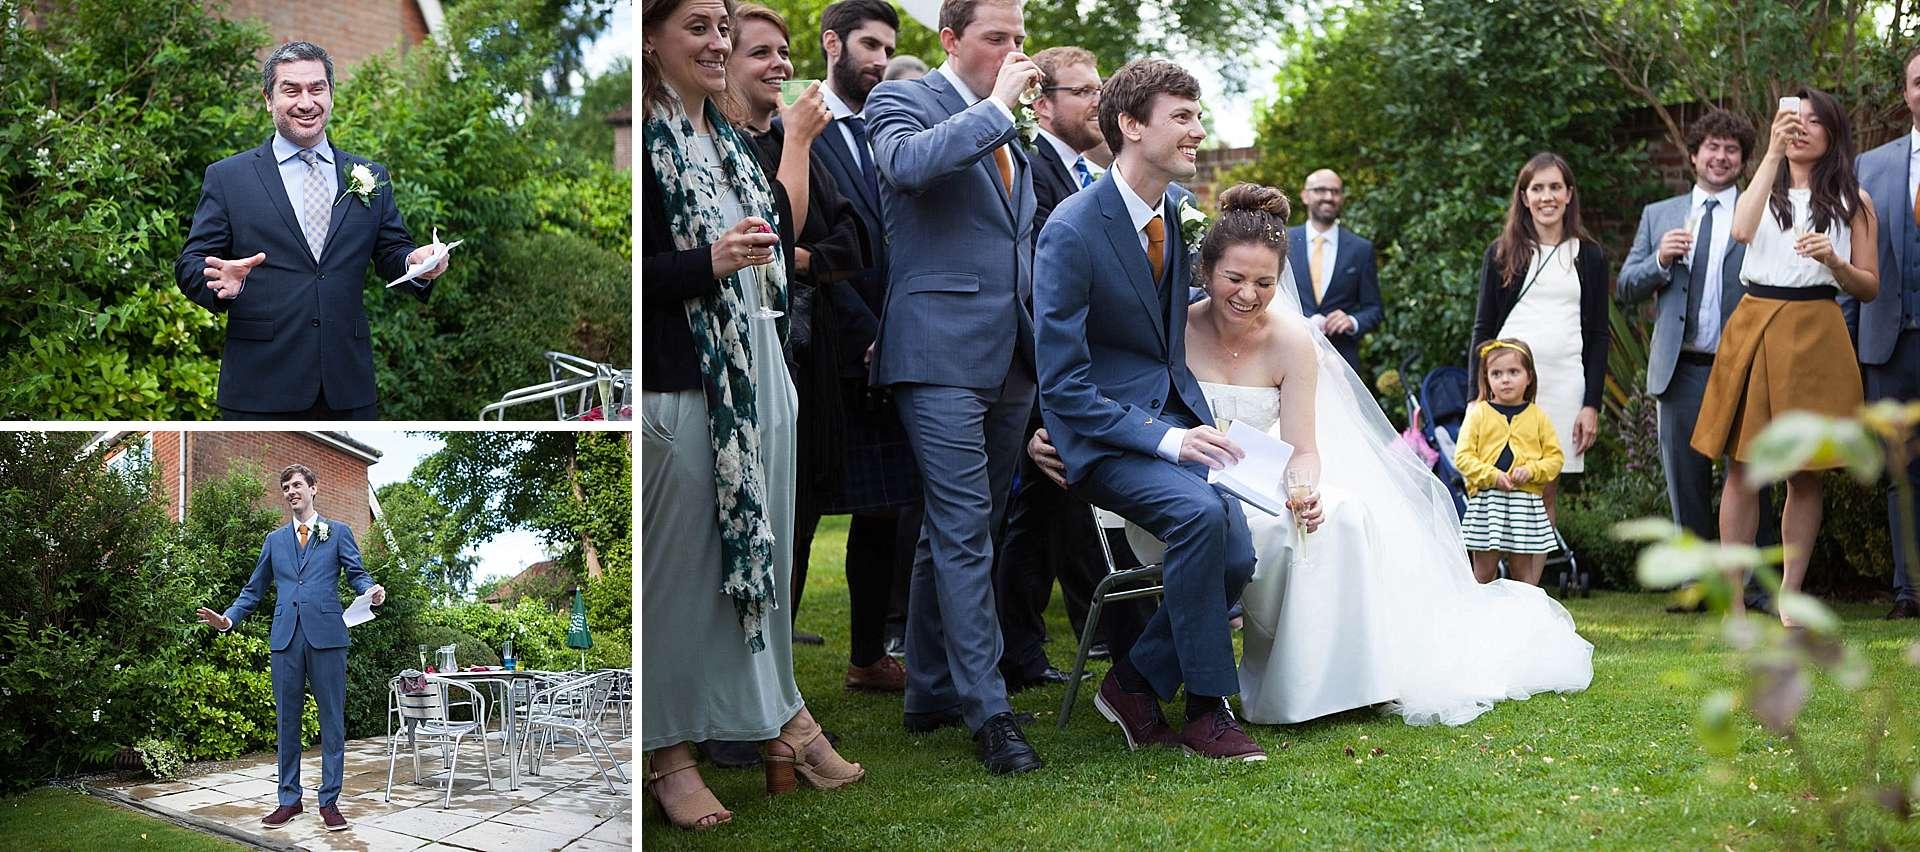 Elyse and Allan's wedding